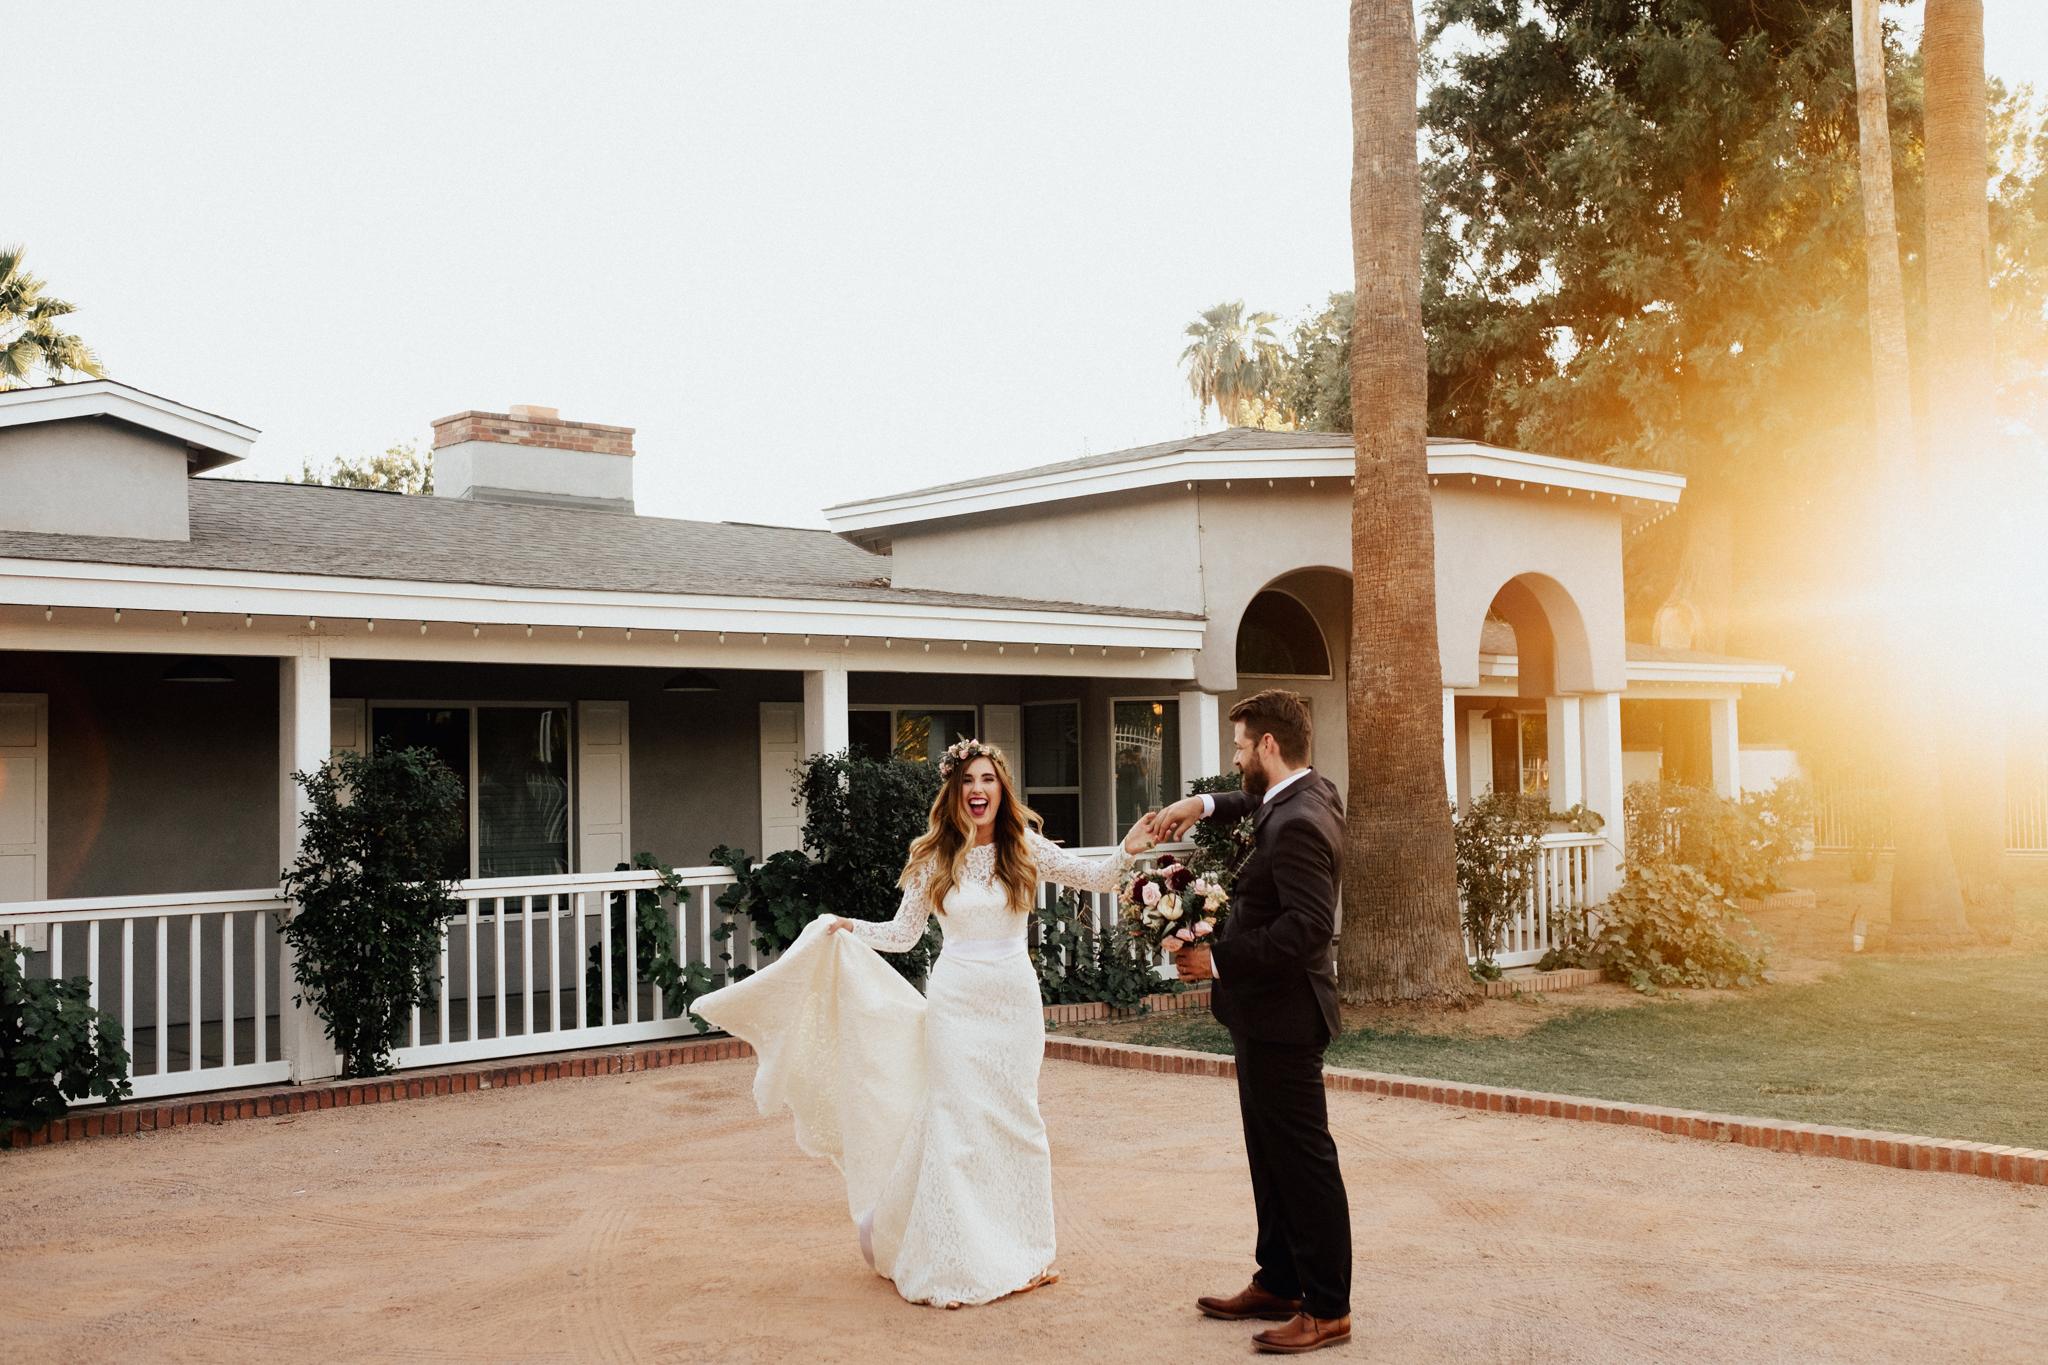 Arizona-Adventure-Elopement-Wedding-Photographer-47.jpg